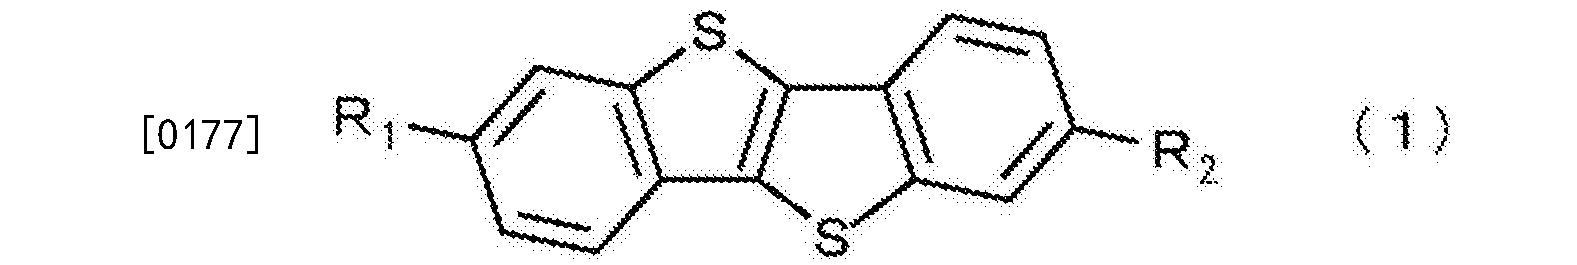 Figure CN107534050AD00251